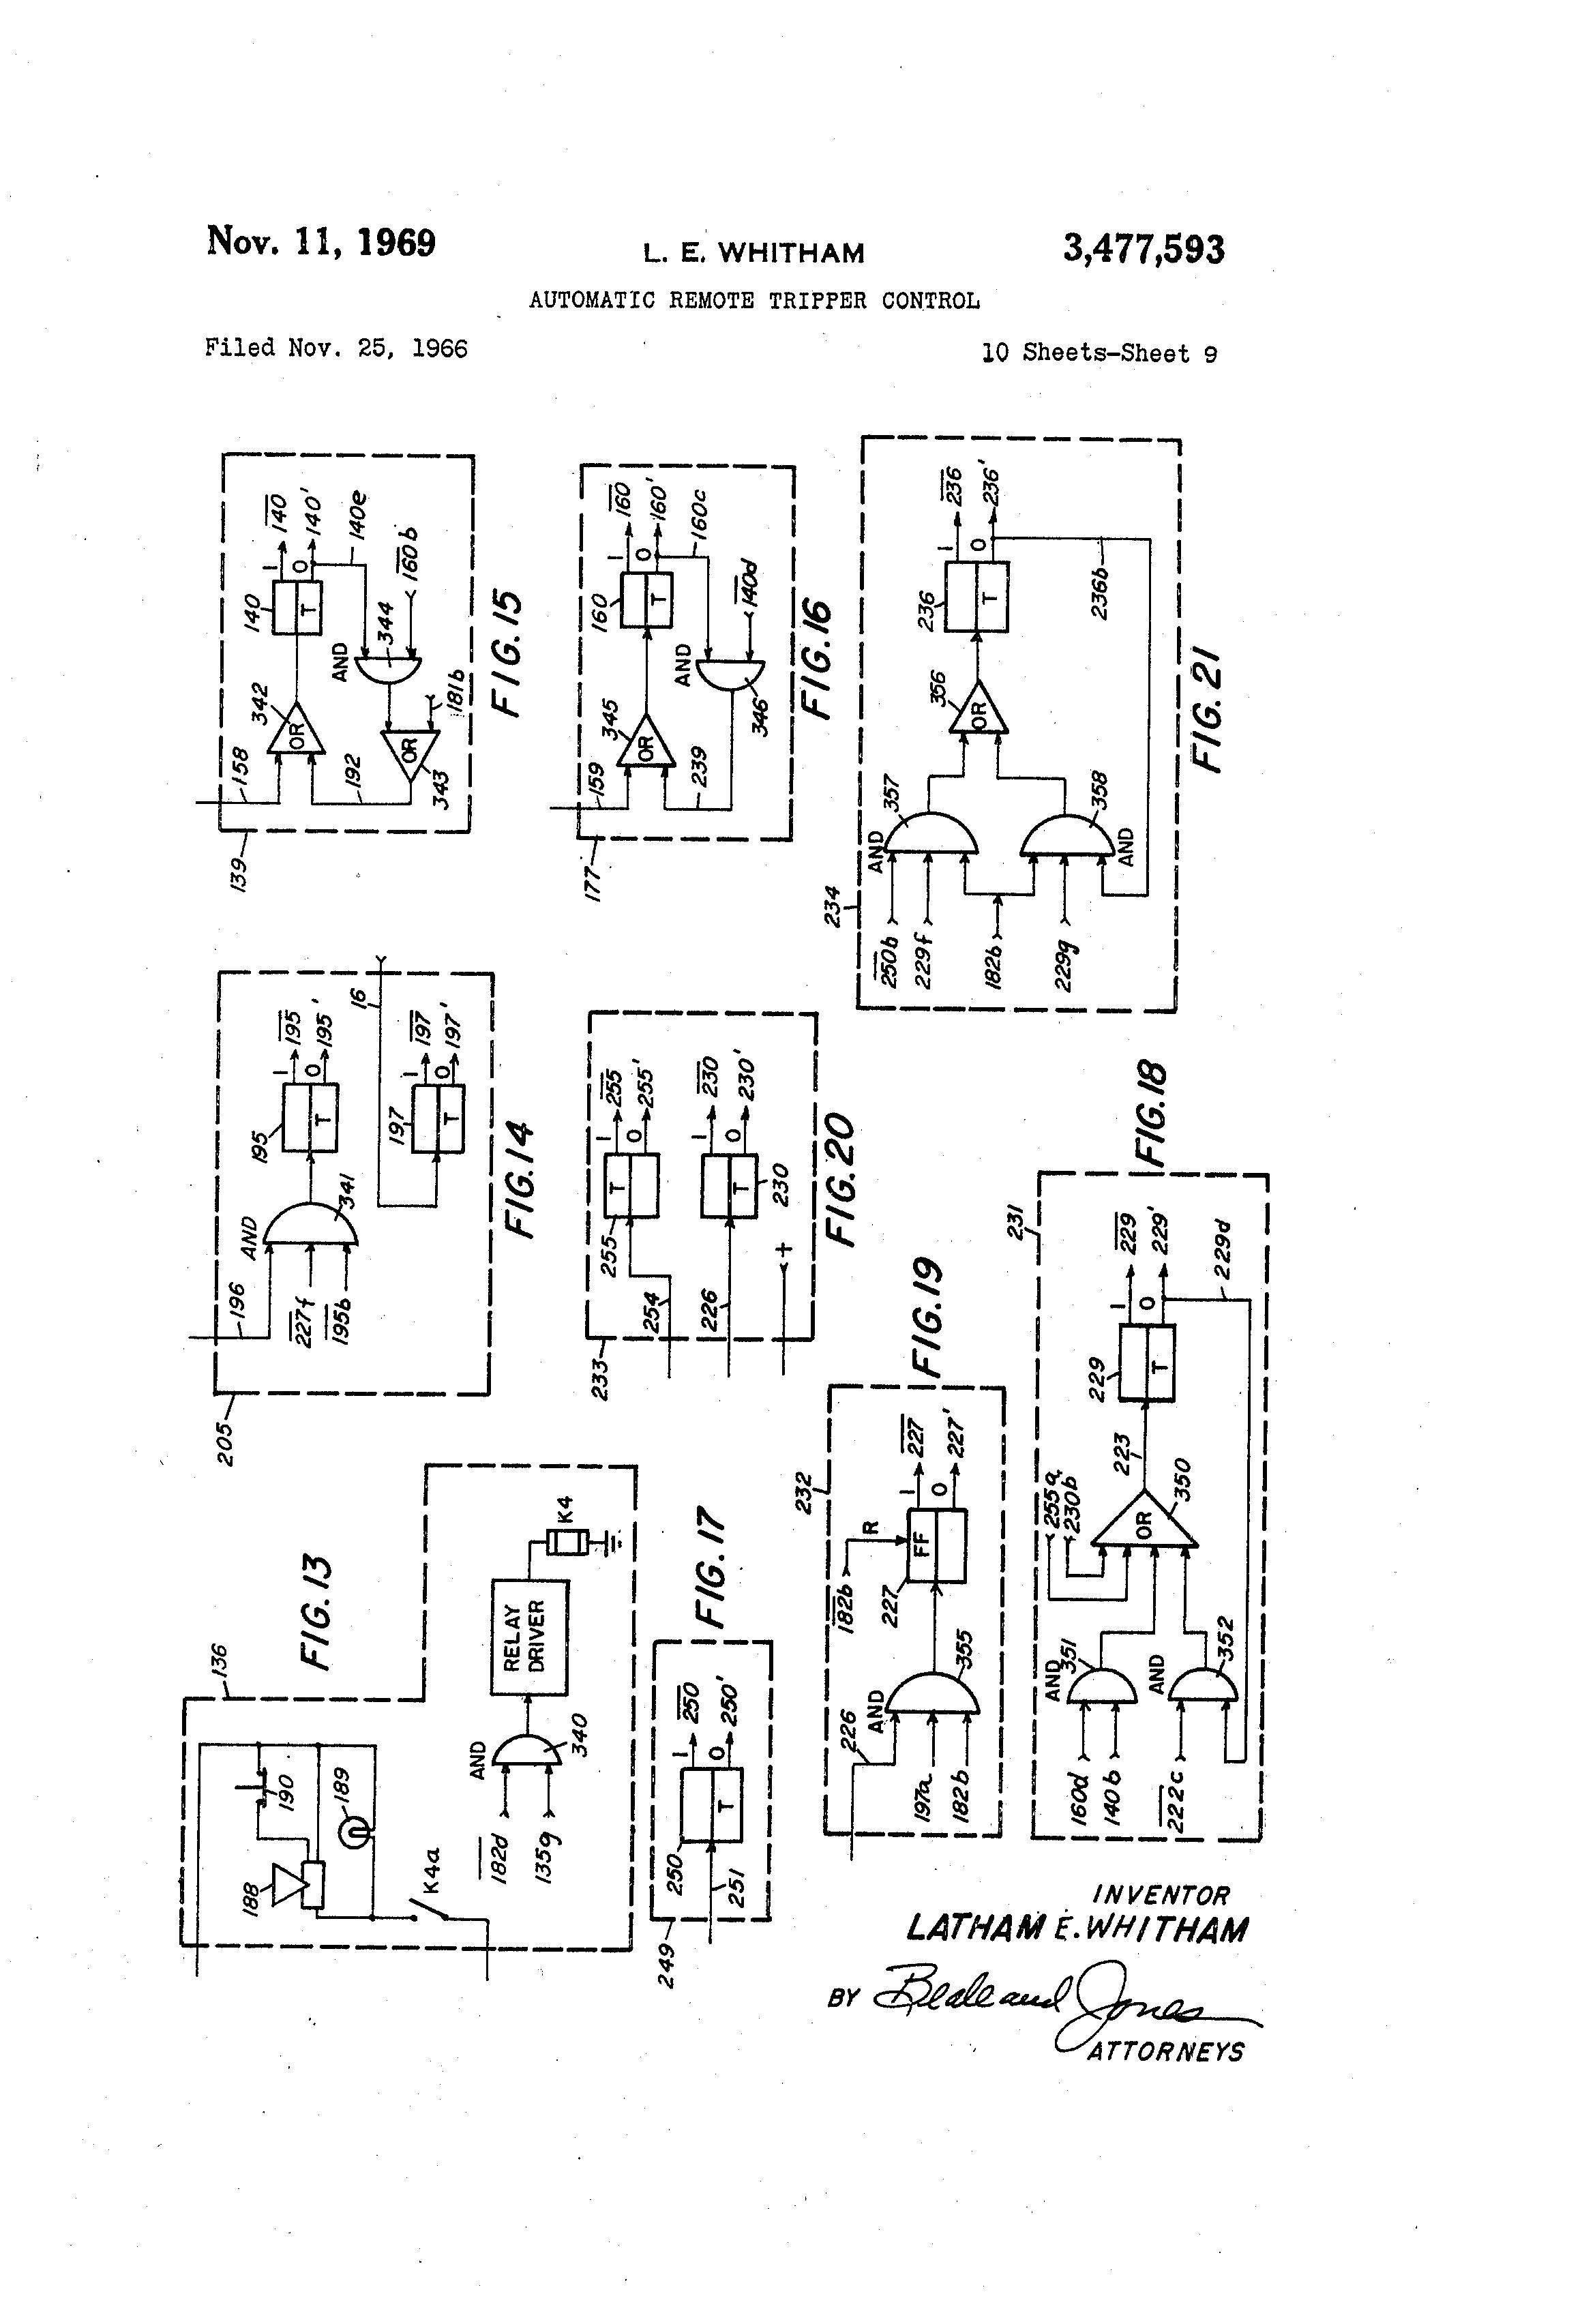 valve actuator contactor diagram